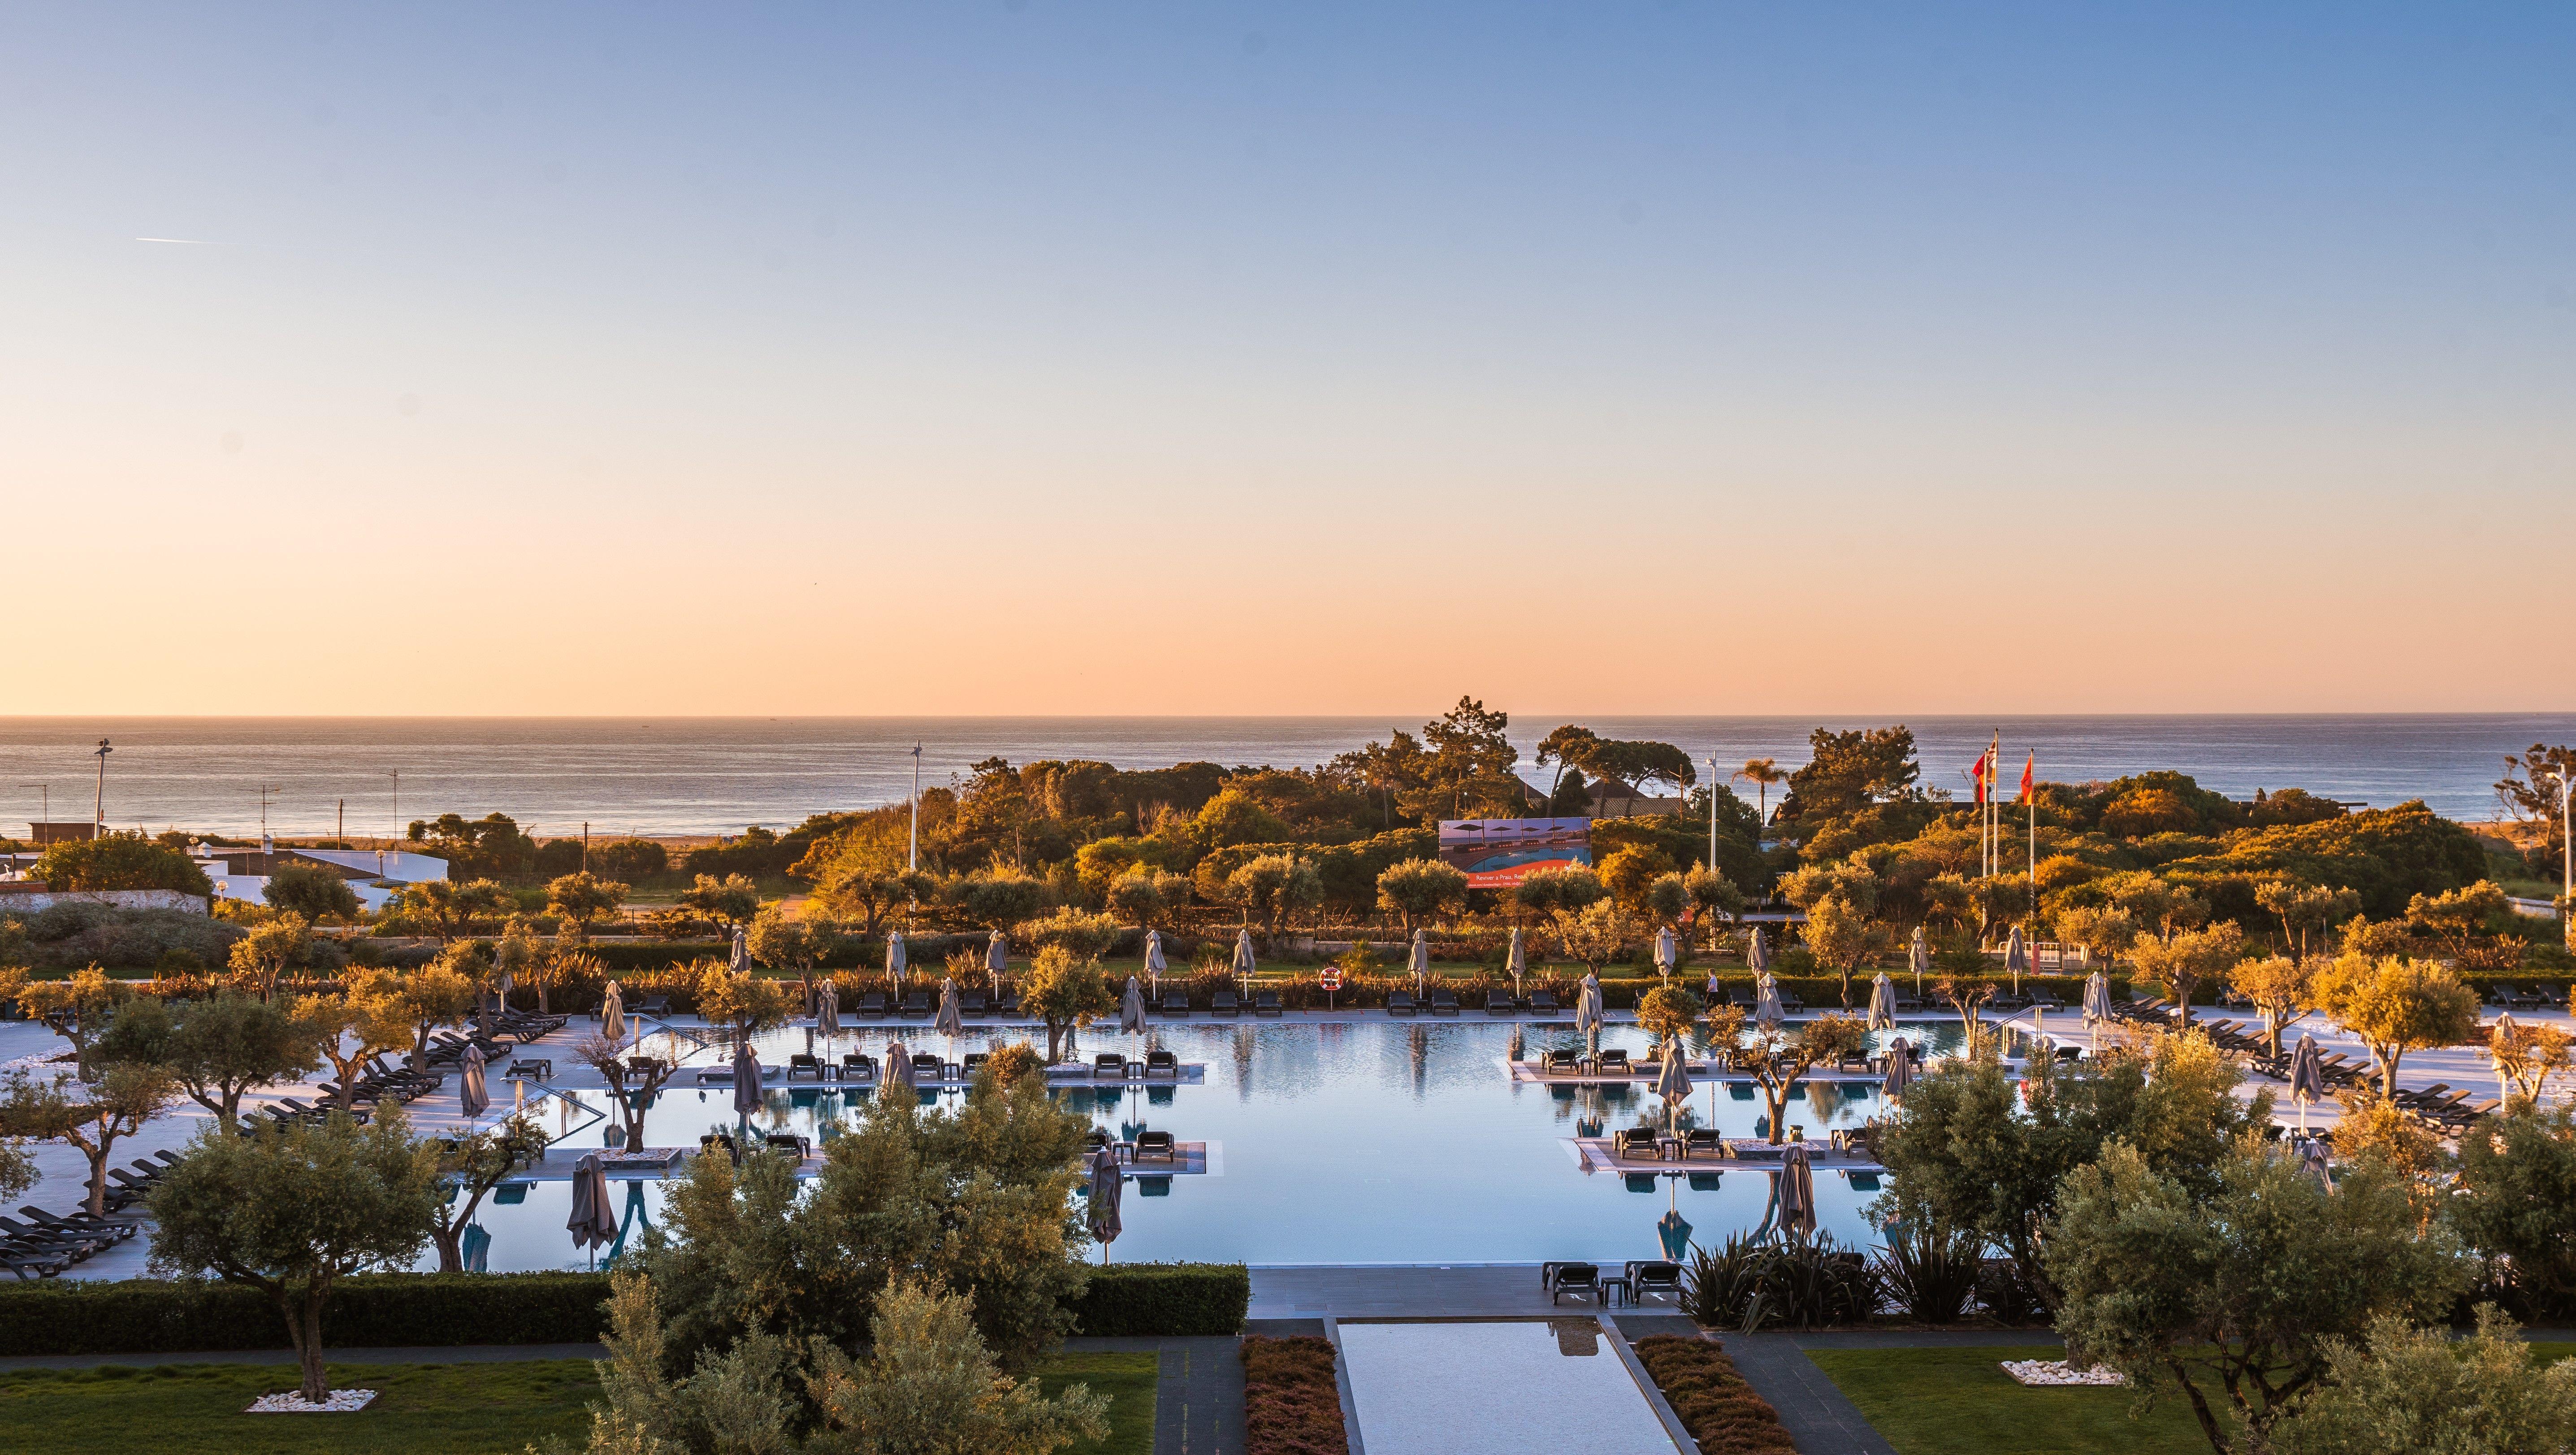 Sunset Hotel Vila Gale Lagos Algarve Portugal Hoteis Vilas